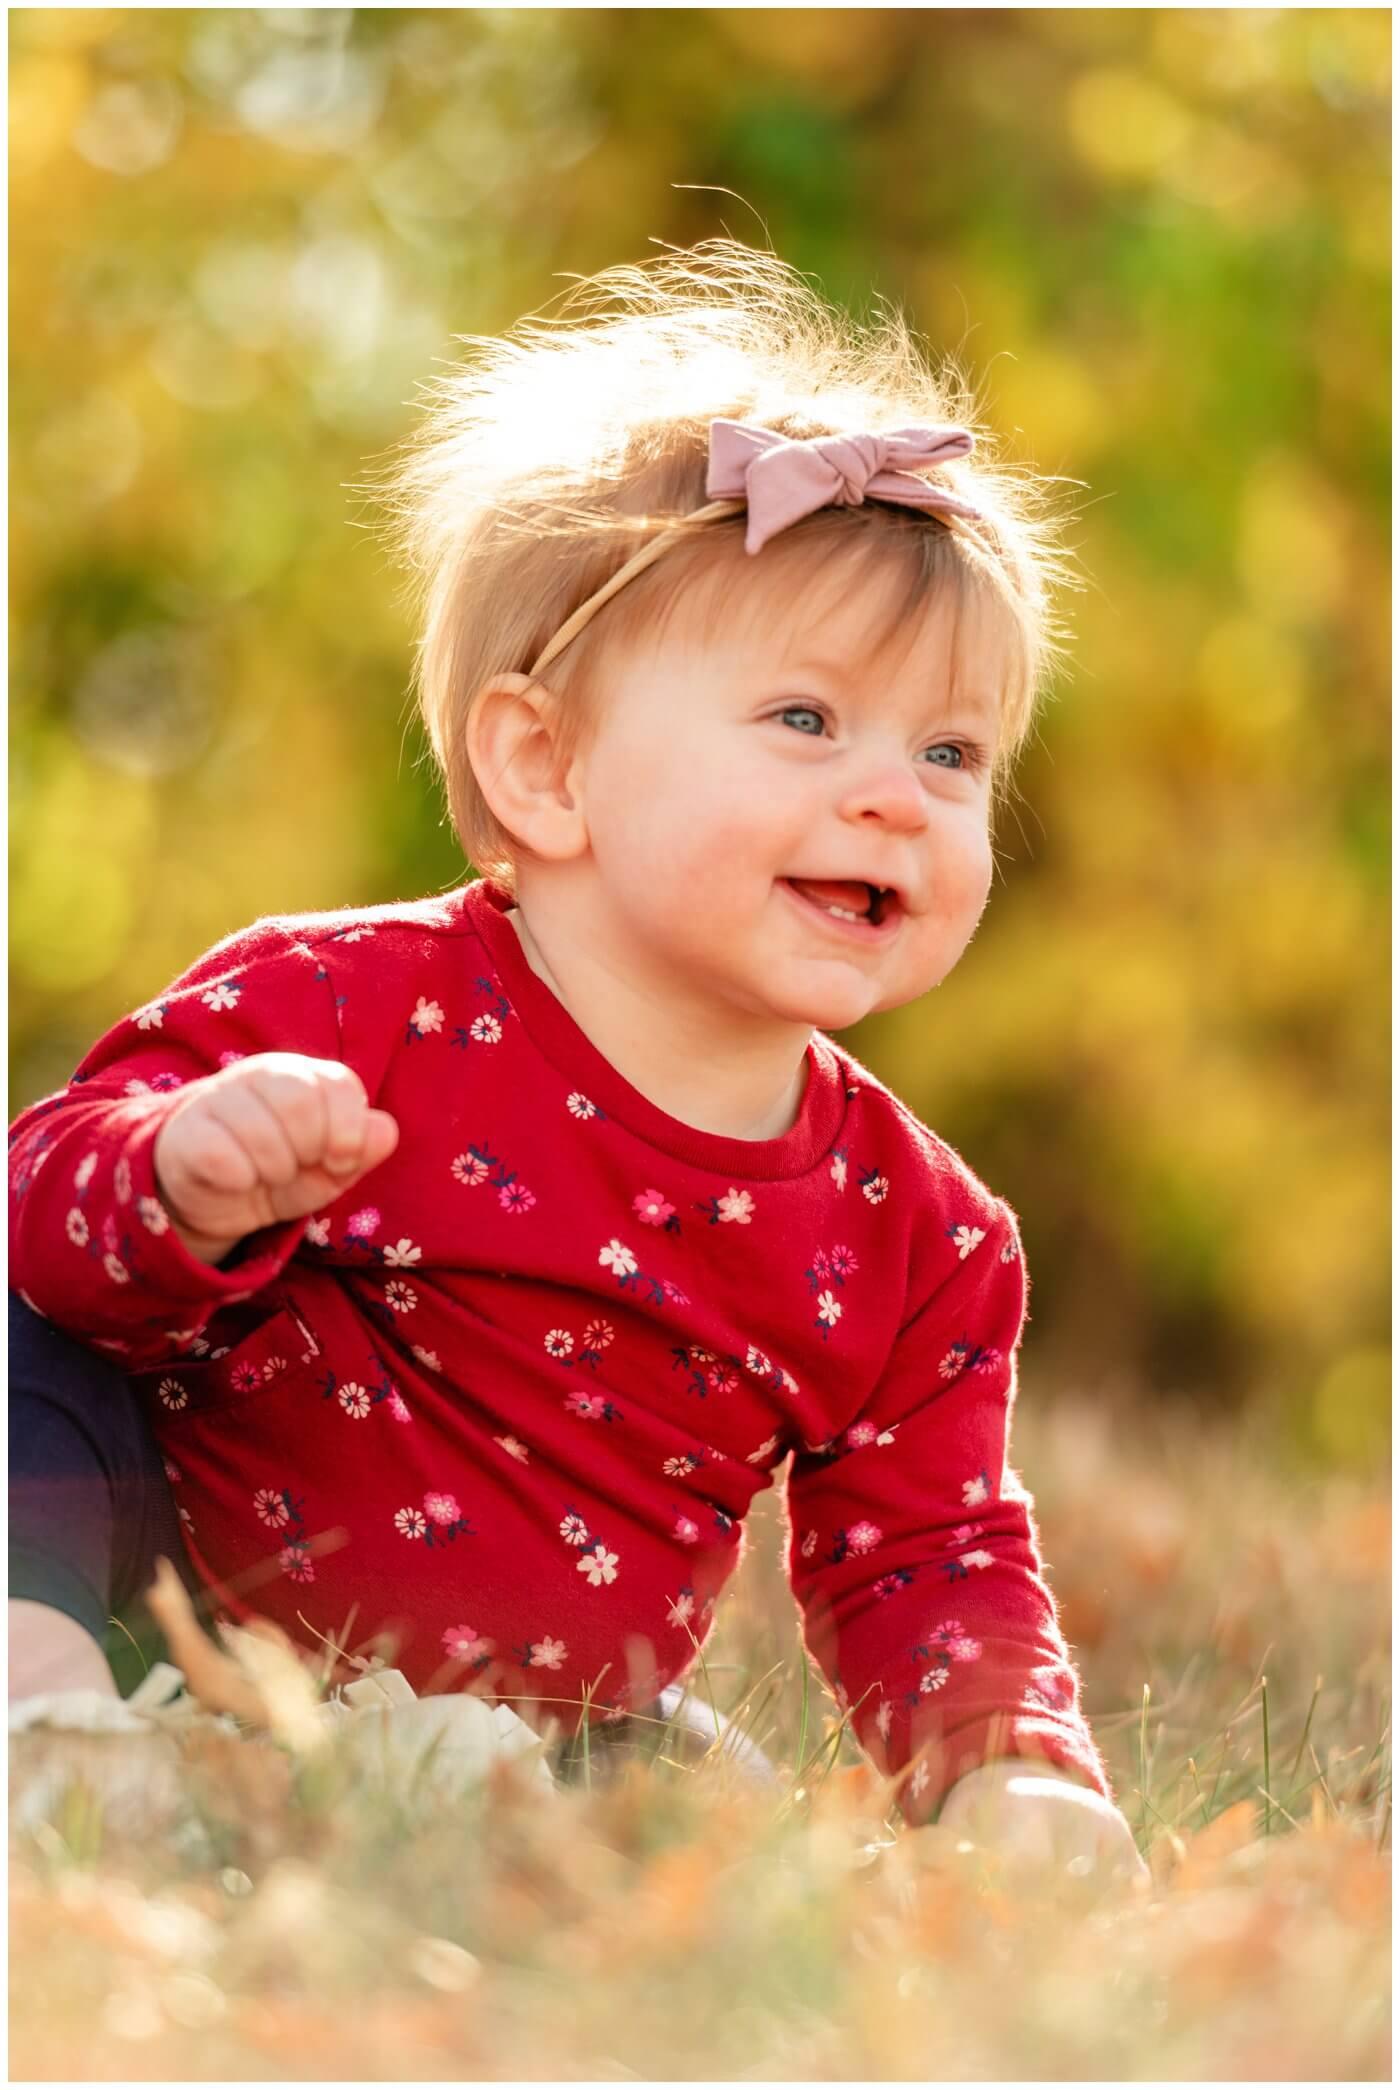 Regina-Family-Photography-Eyre-Family-Douglas-Park-Hill-04-Sun-in-poofy-hair